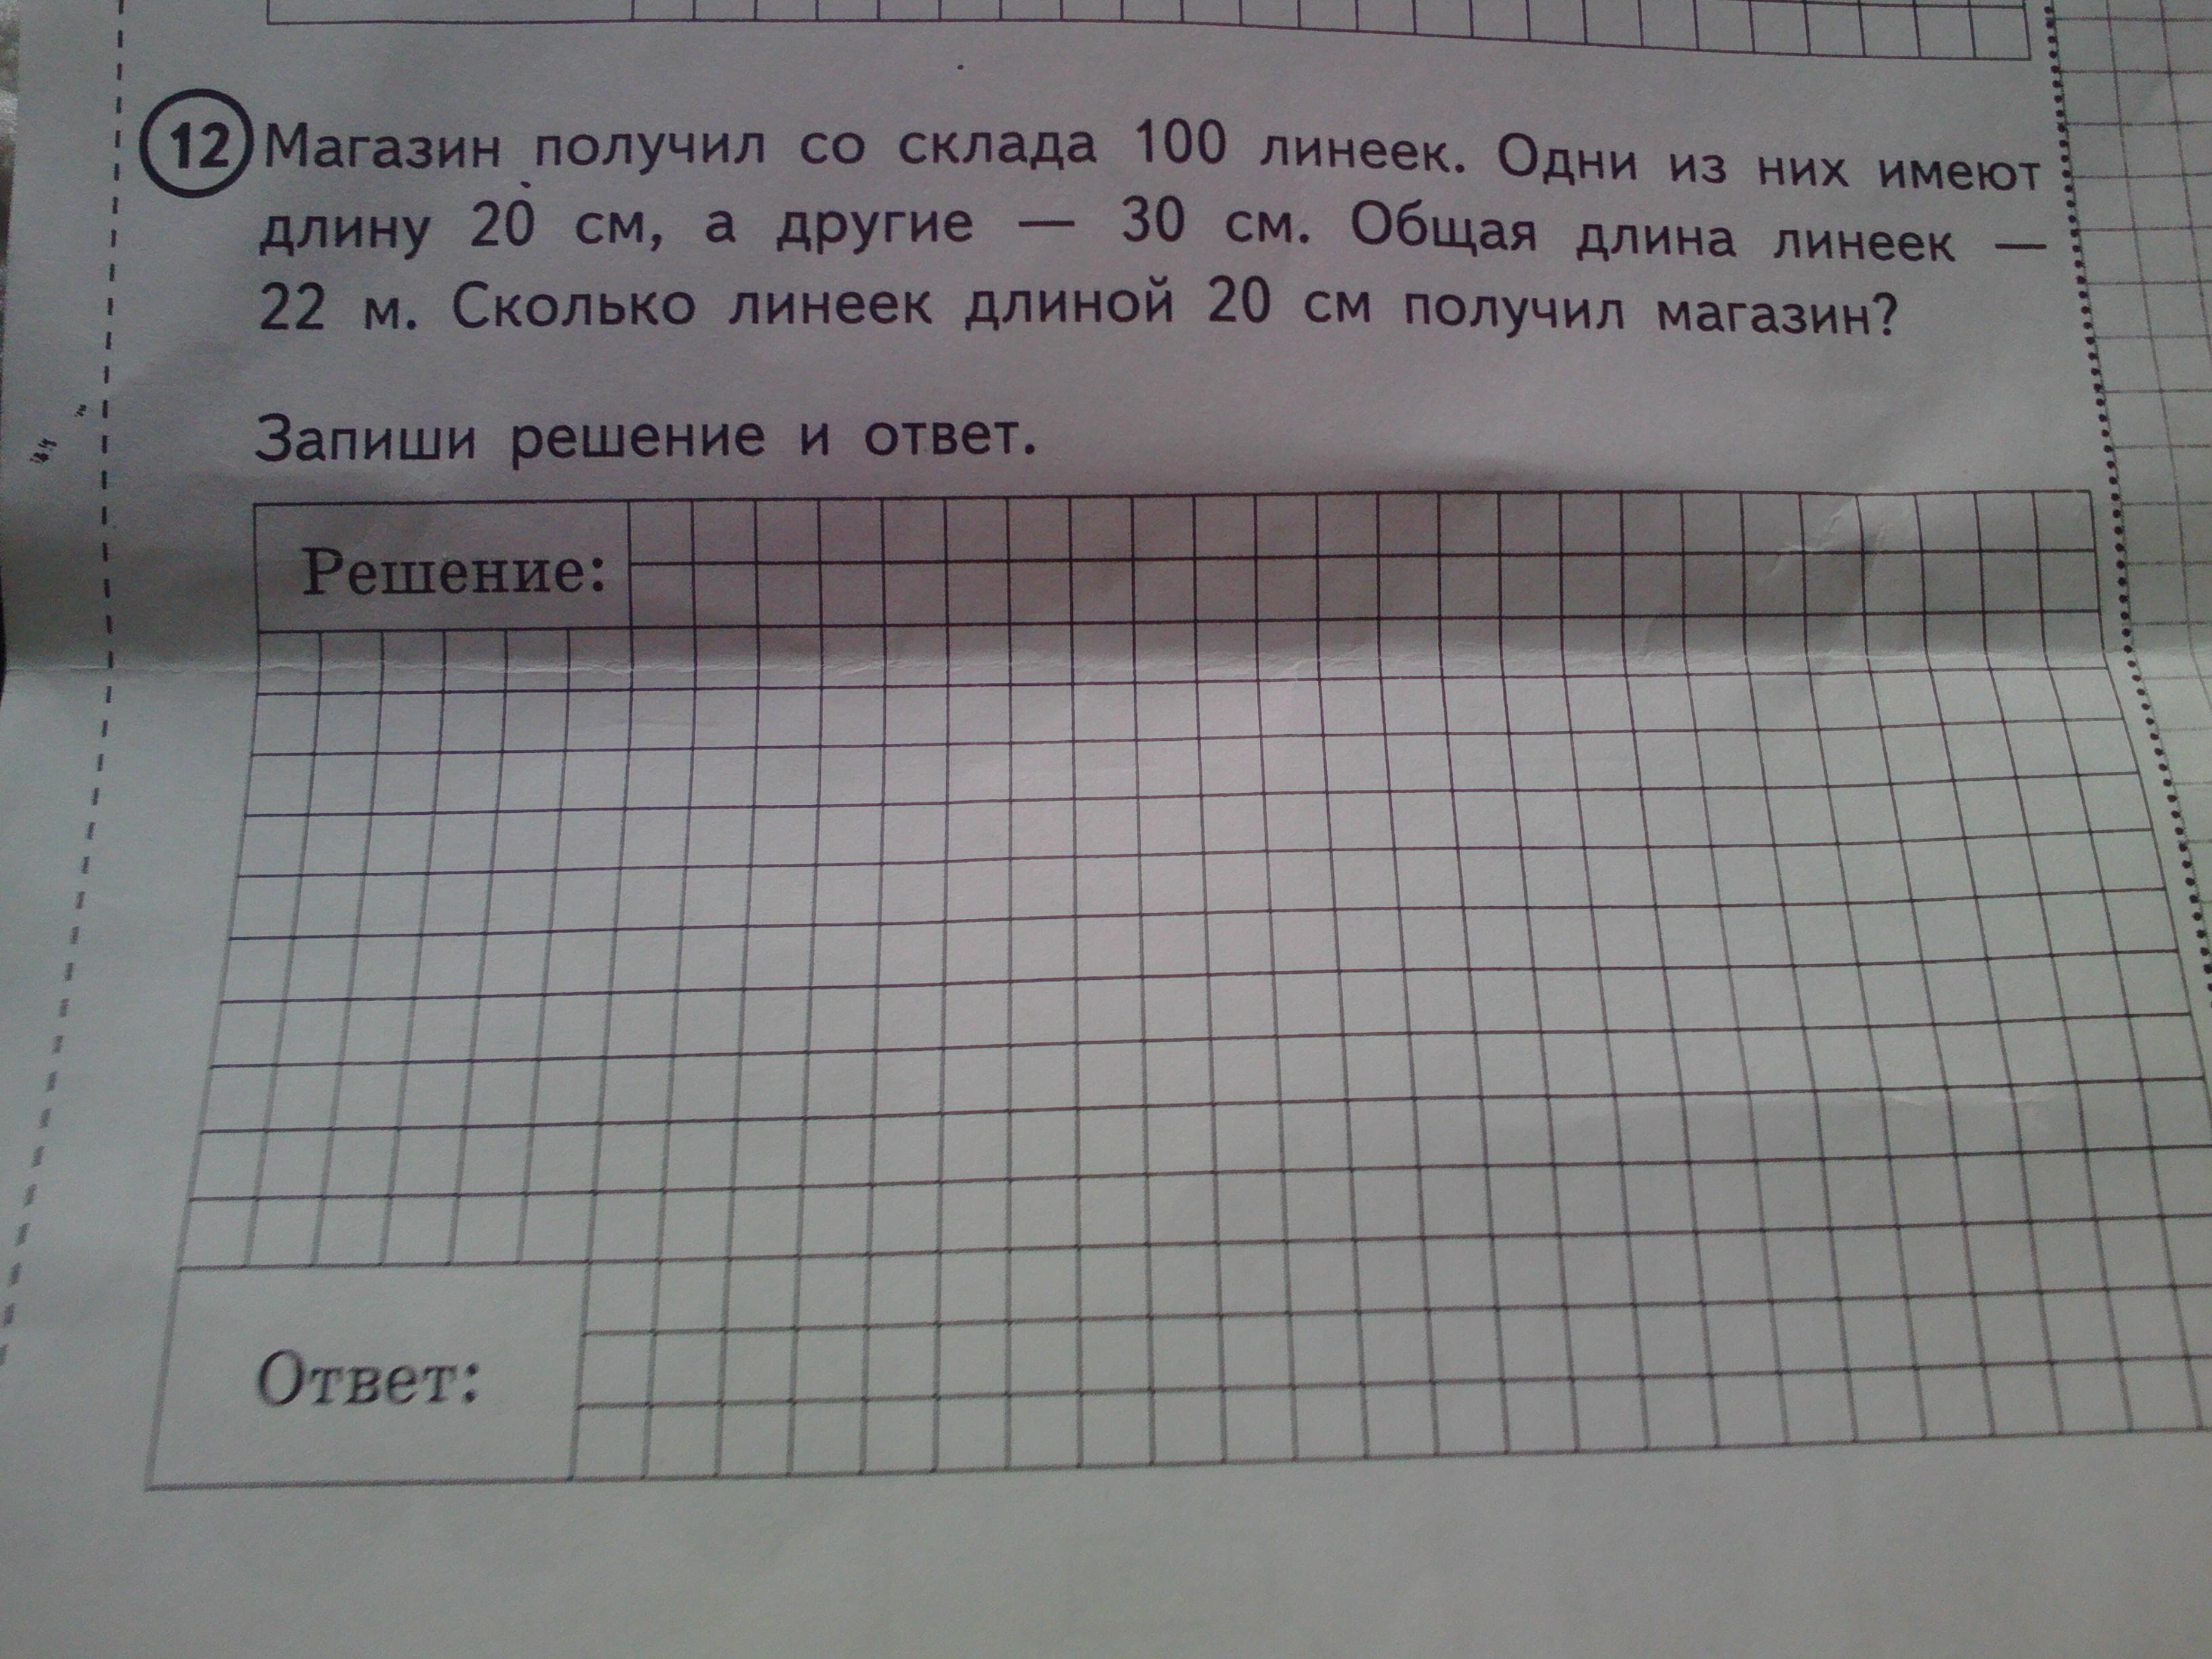 Магазин Получил Со Склада 100